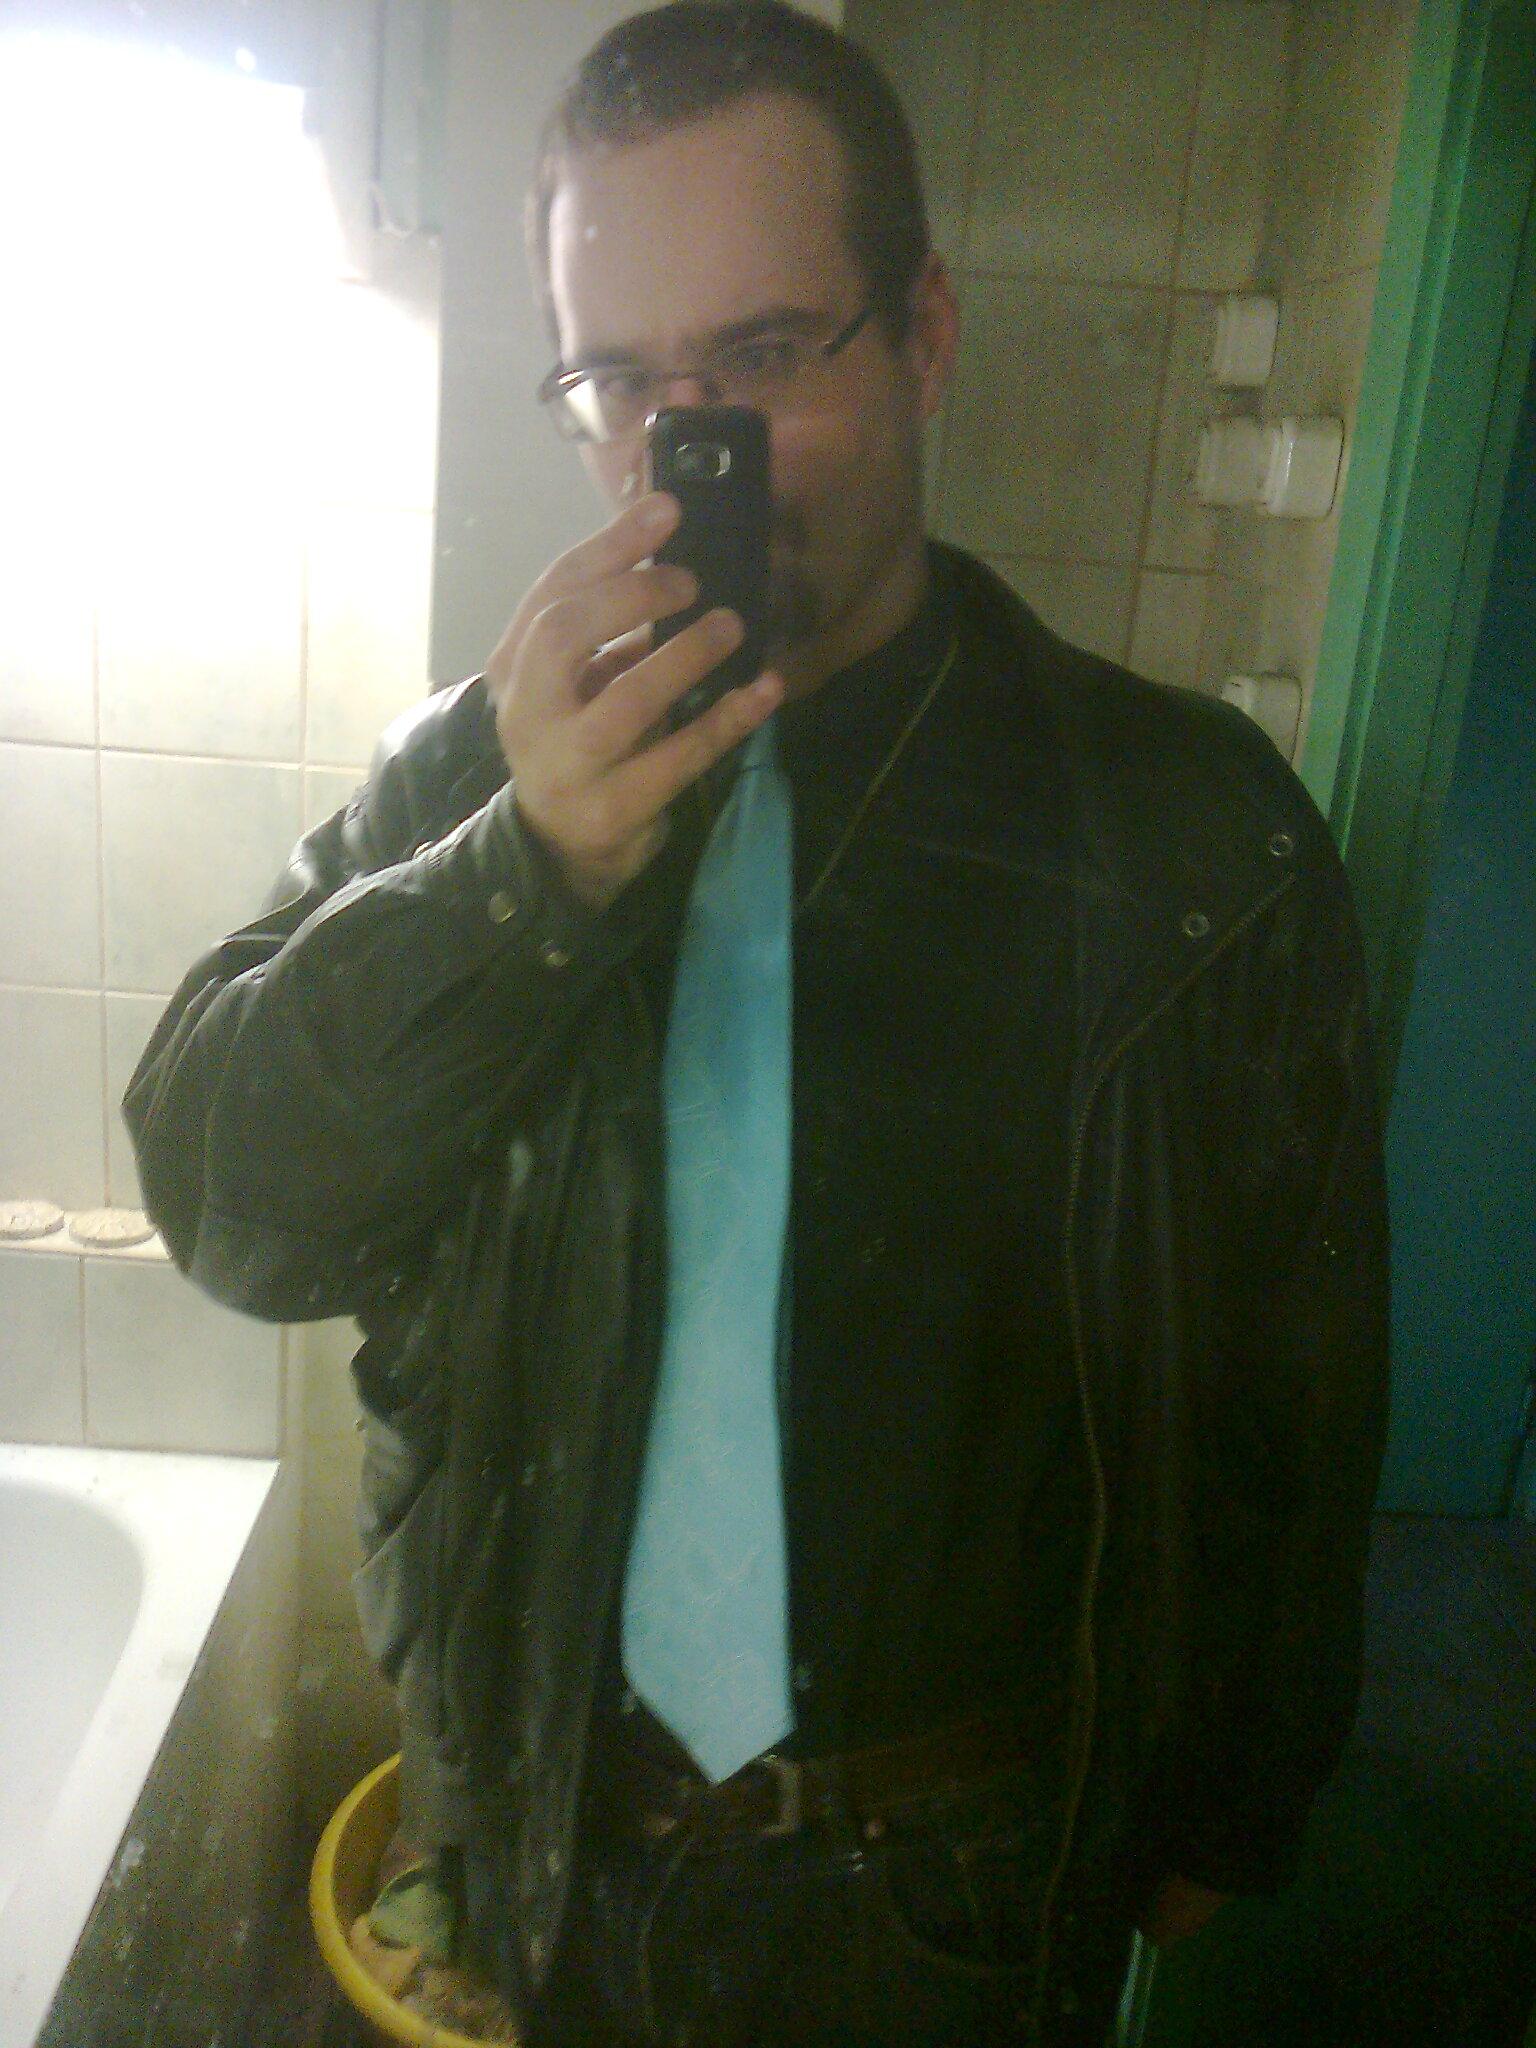 Going to work... Derp! :D